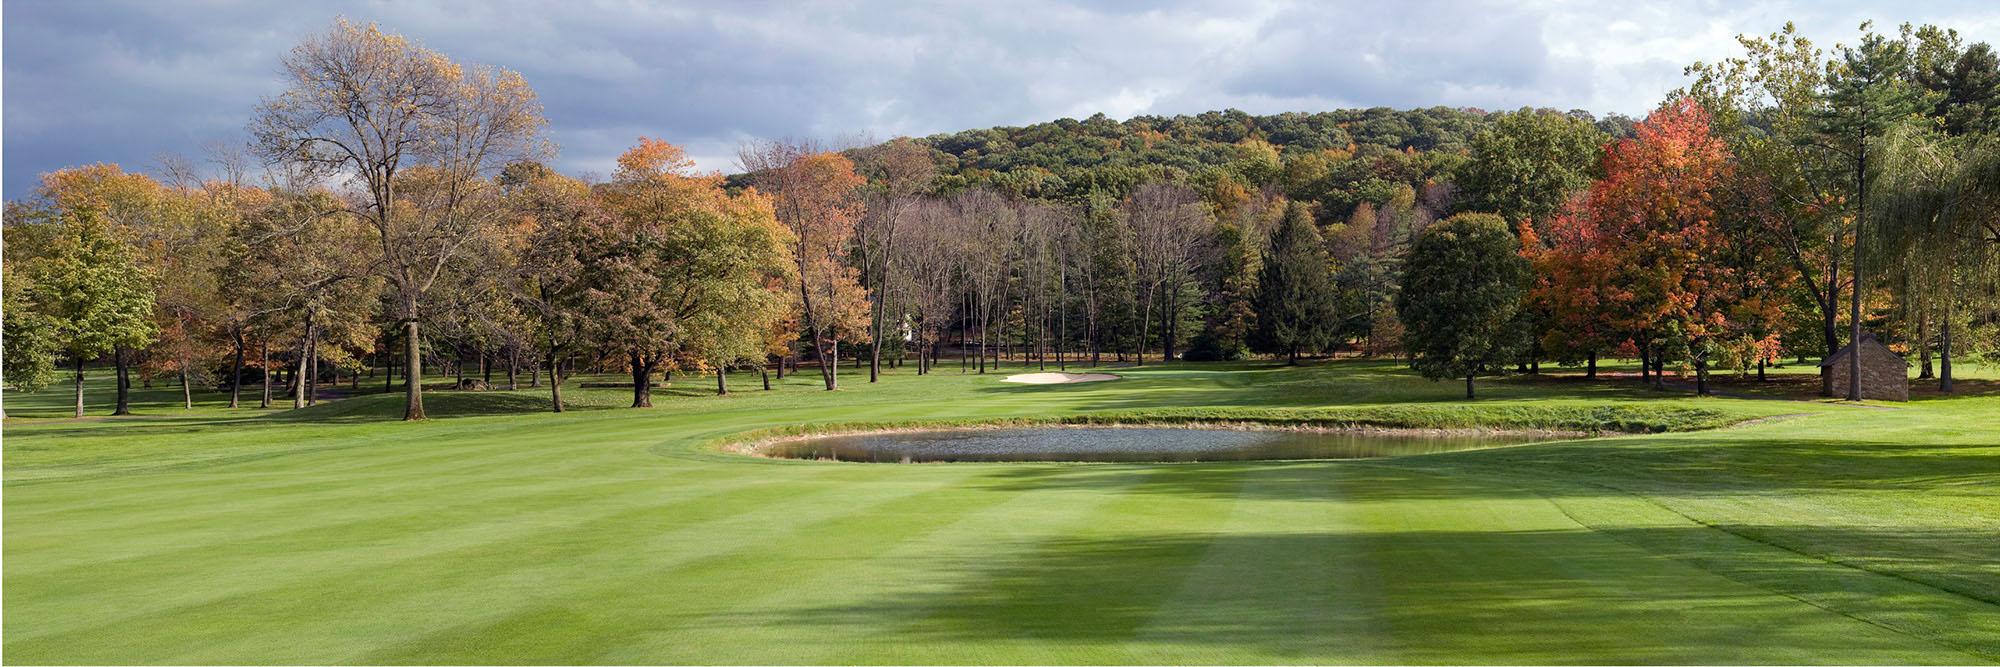 Golf Course Image - Saucon Valley Grace No. 8